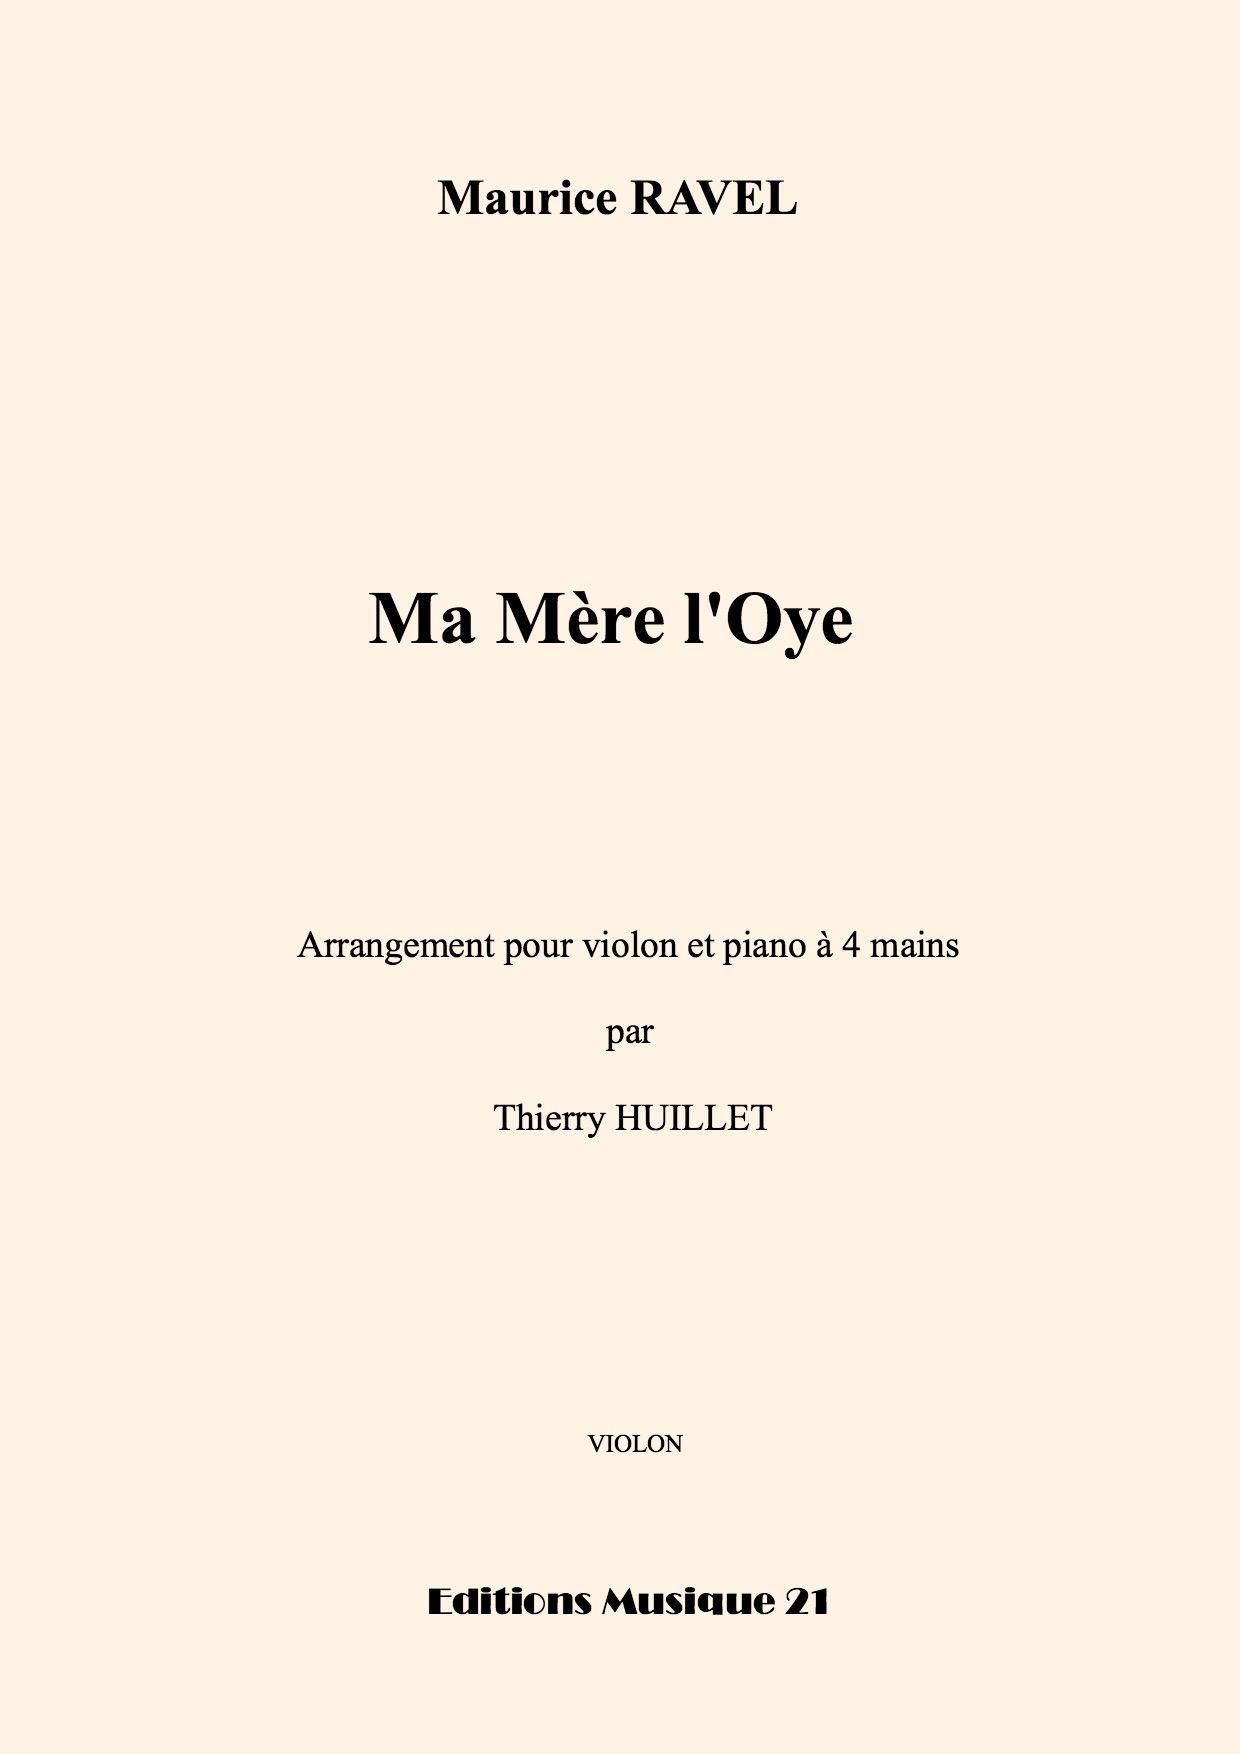 Ravel: Ma Mère L'Oye